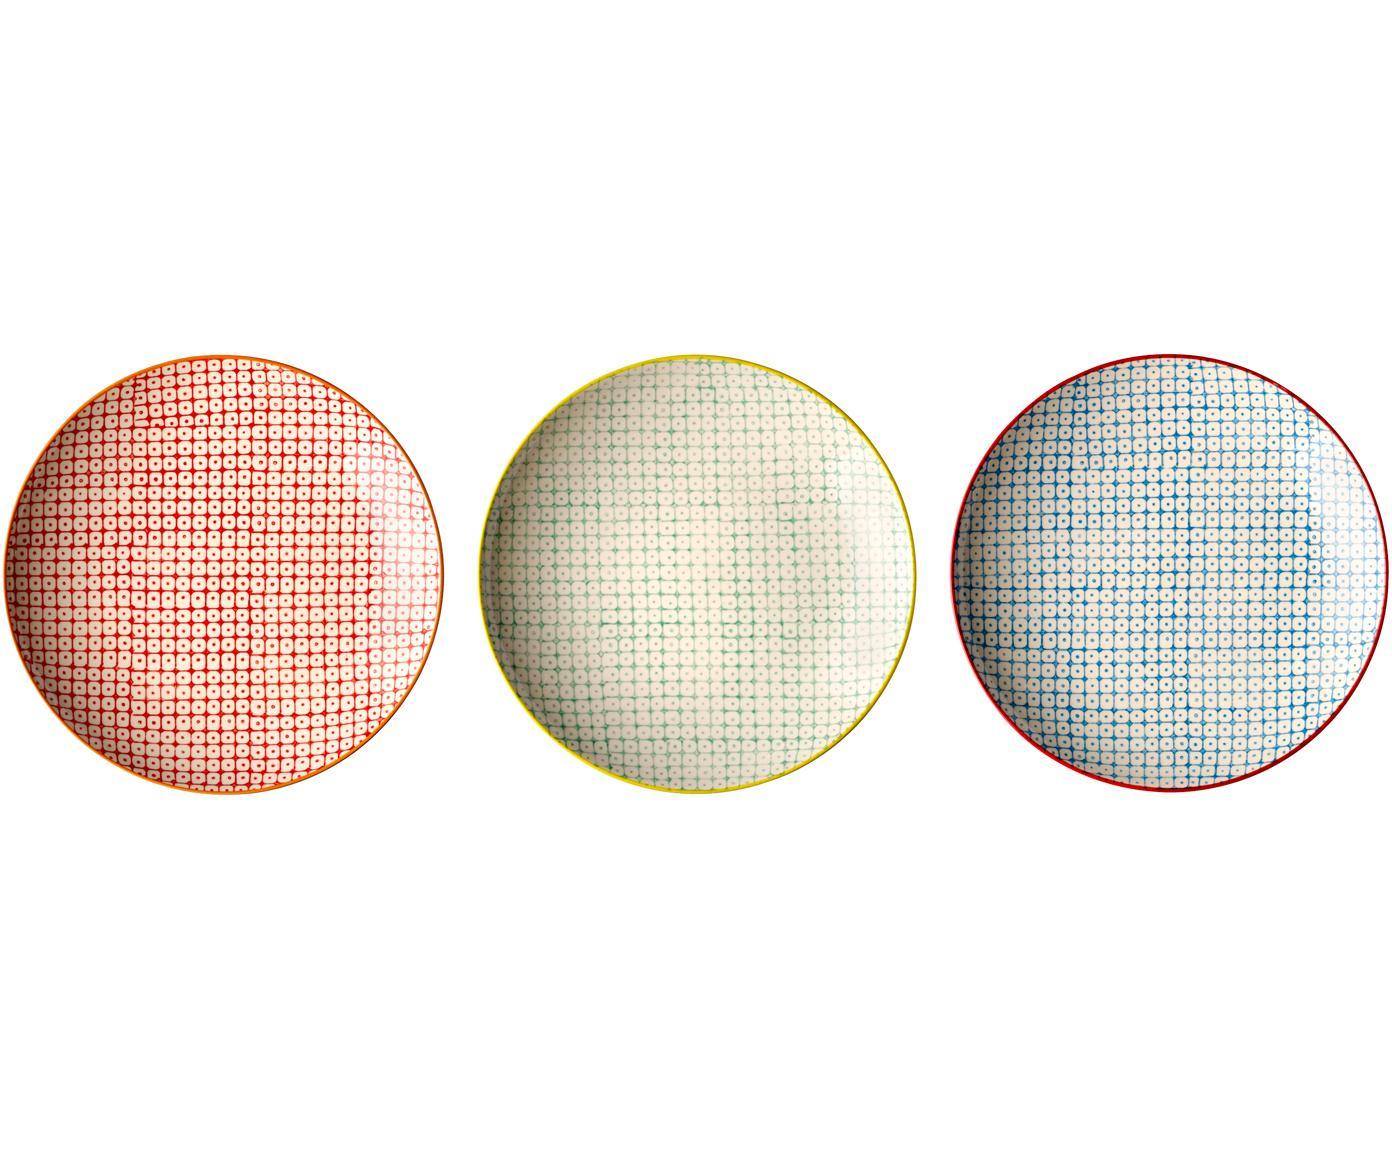 Dinerbordenset Carla, 3-delig, Keramiek, Multicolour, Ø 25 cm